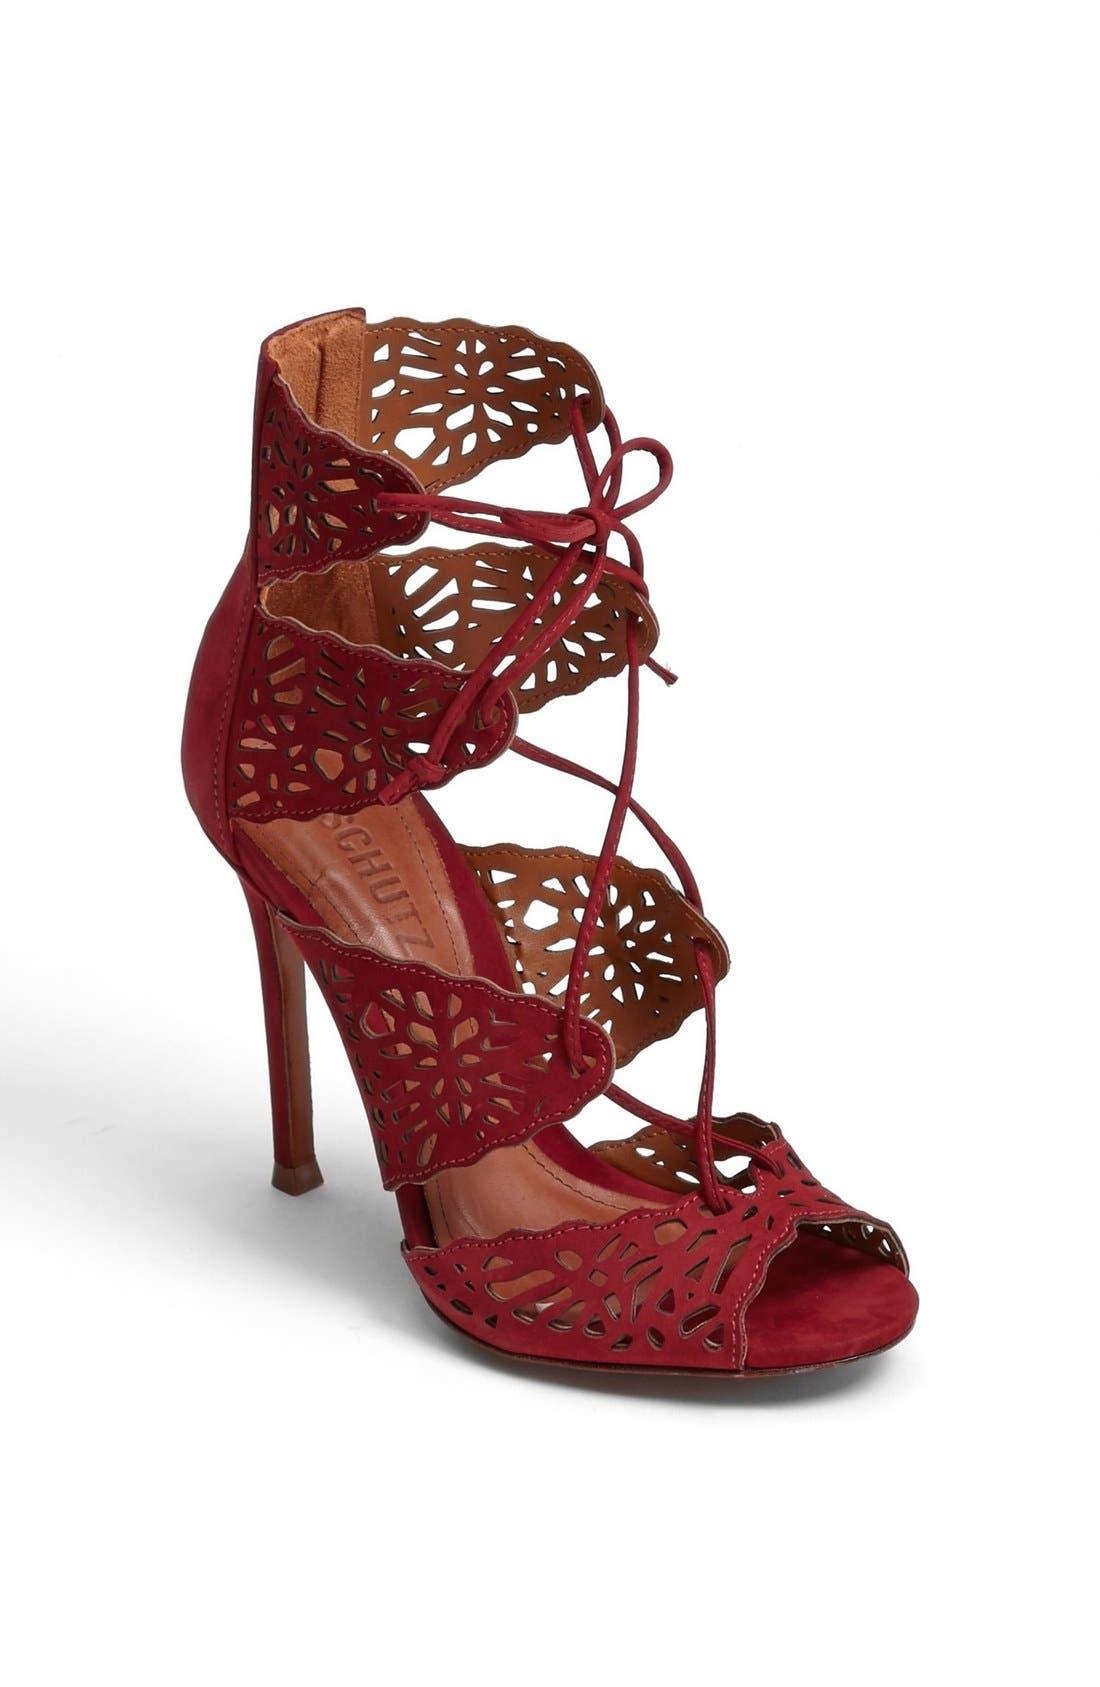 Main Image - Schutz 'Ciara' Perforated Sandal